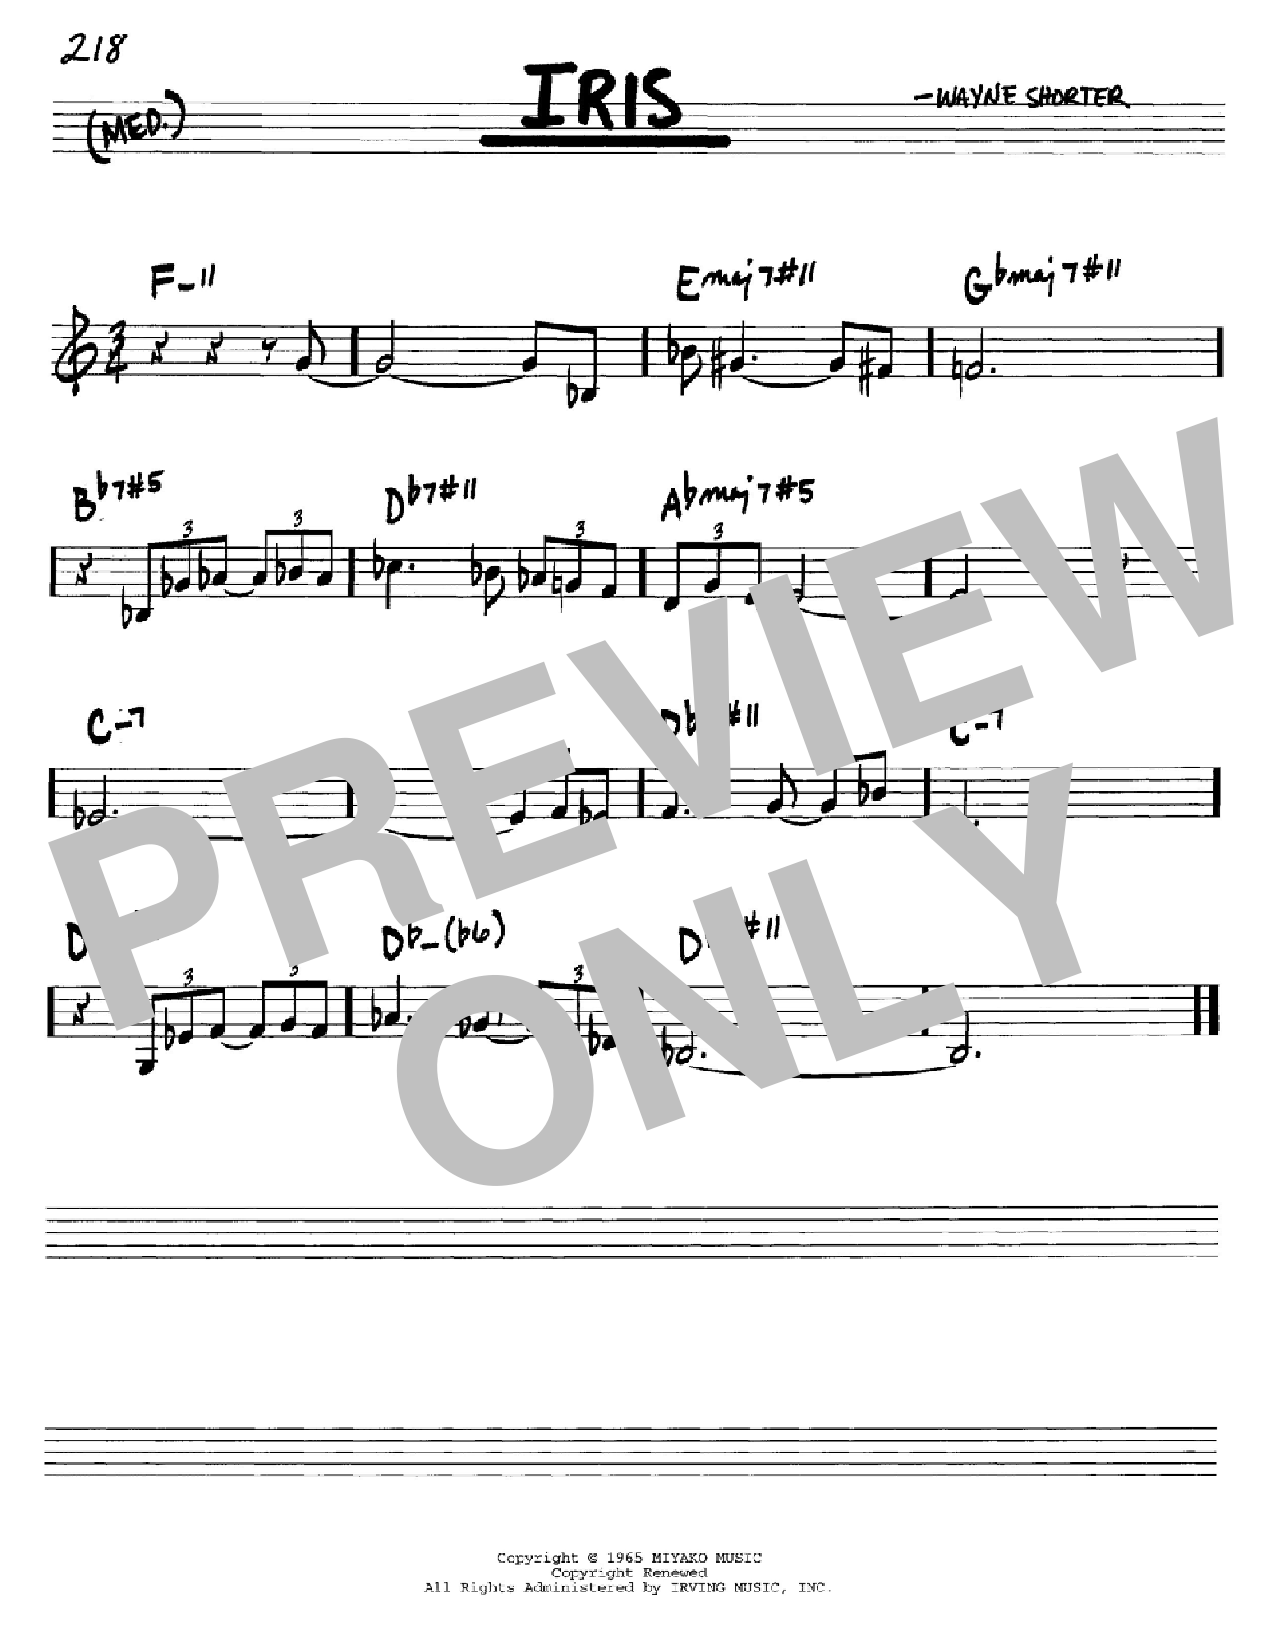 Iris Sheet Music